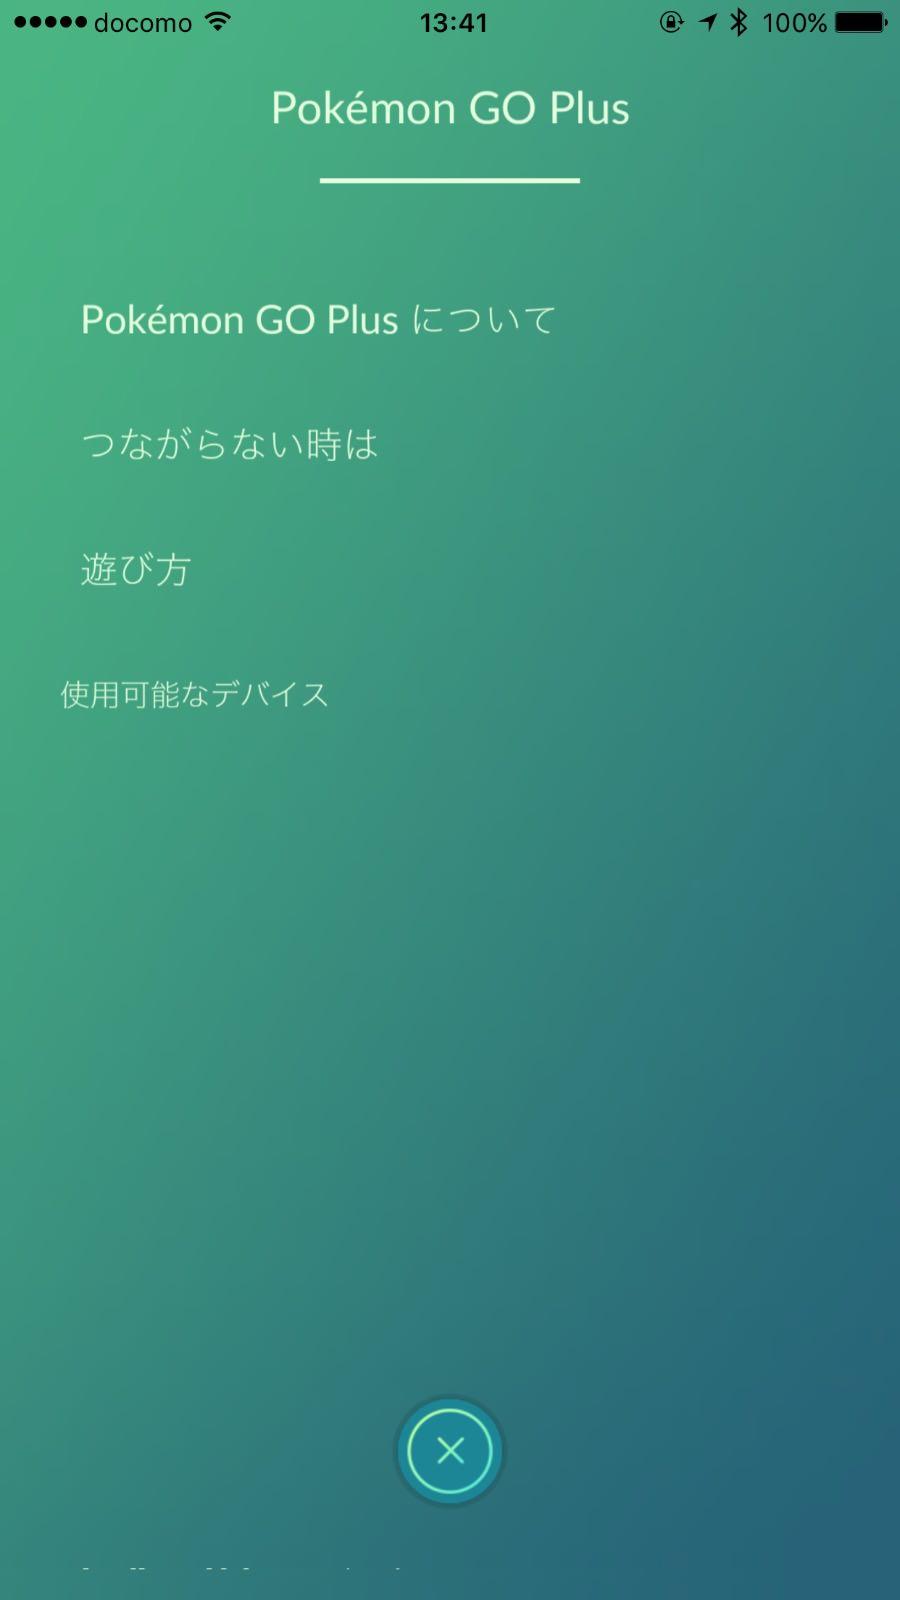 Pokemon go plus review 8588